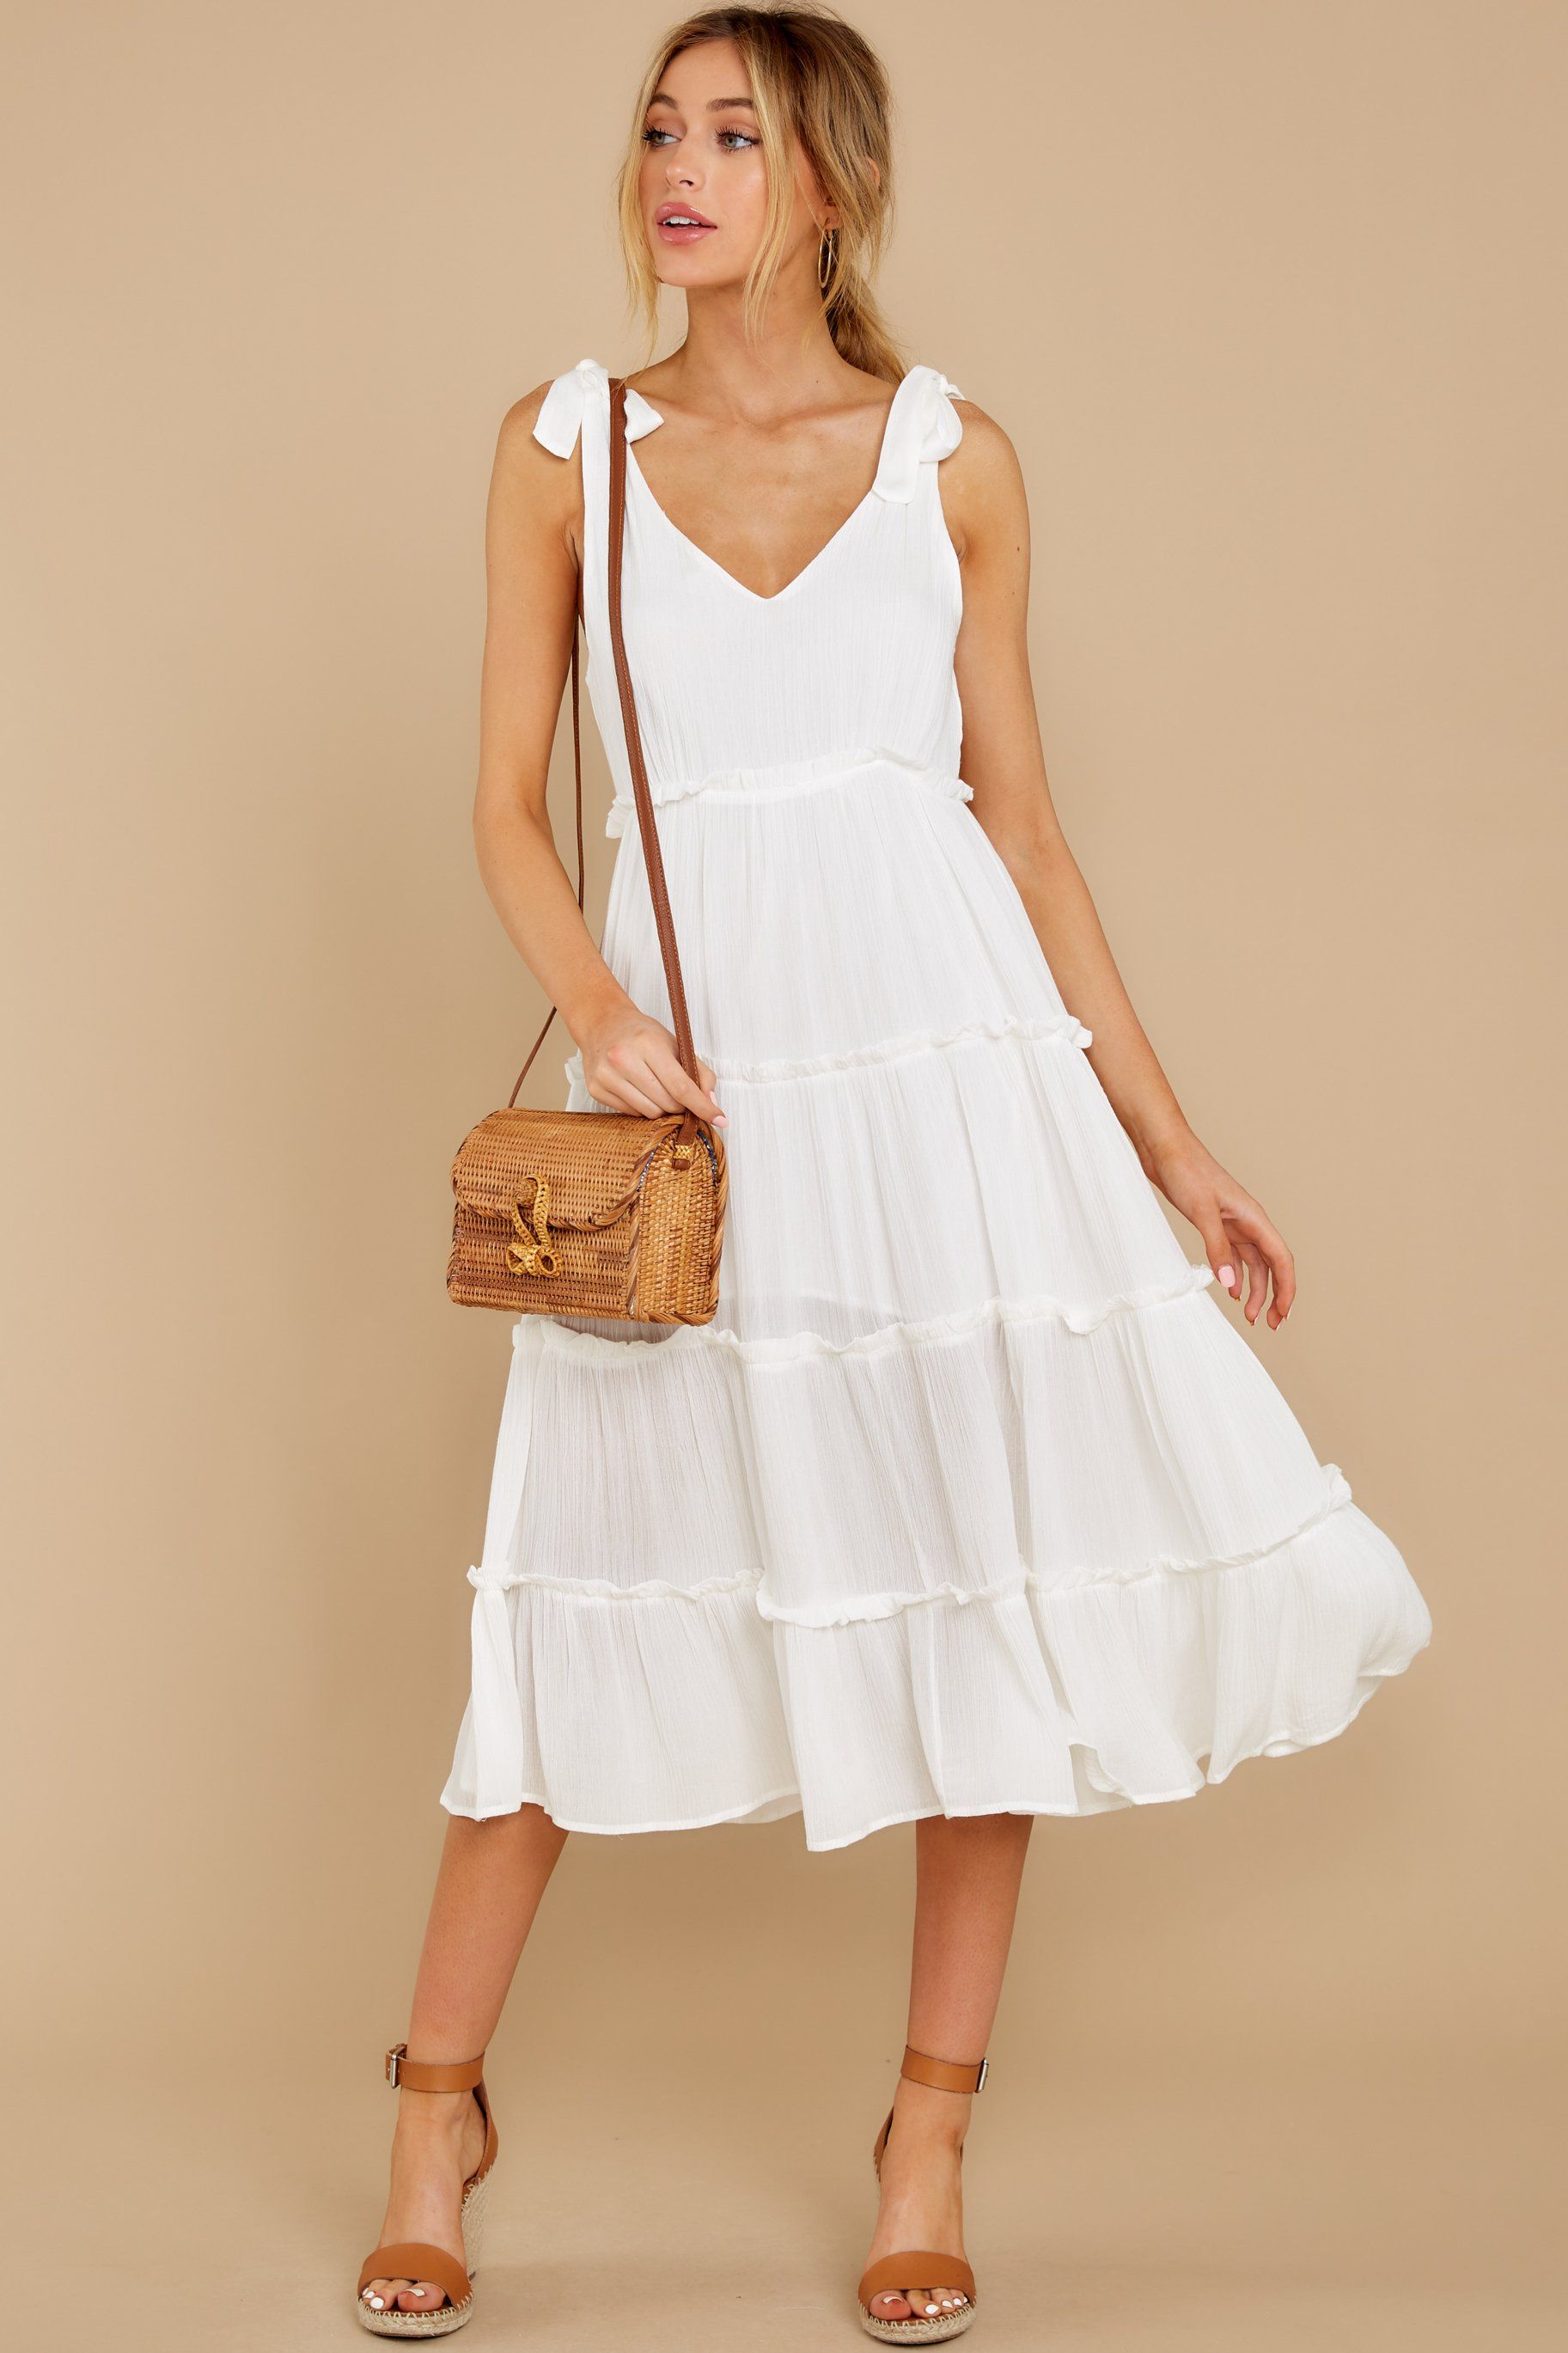 In Full Swing Ivory Midi Dress Glamorous Evening Gowns Ivory Midi Dresses Midi Dress [ 2738 x 1825 Pixel ]